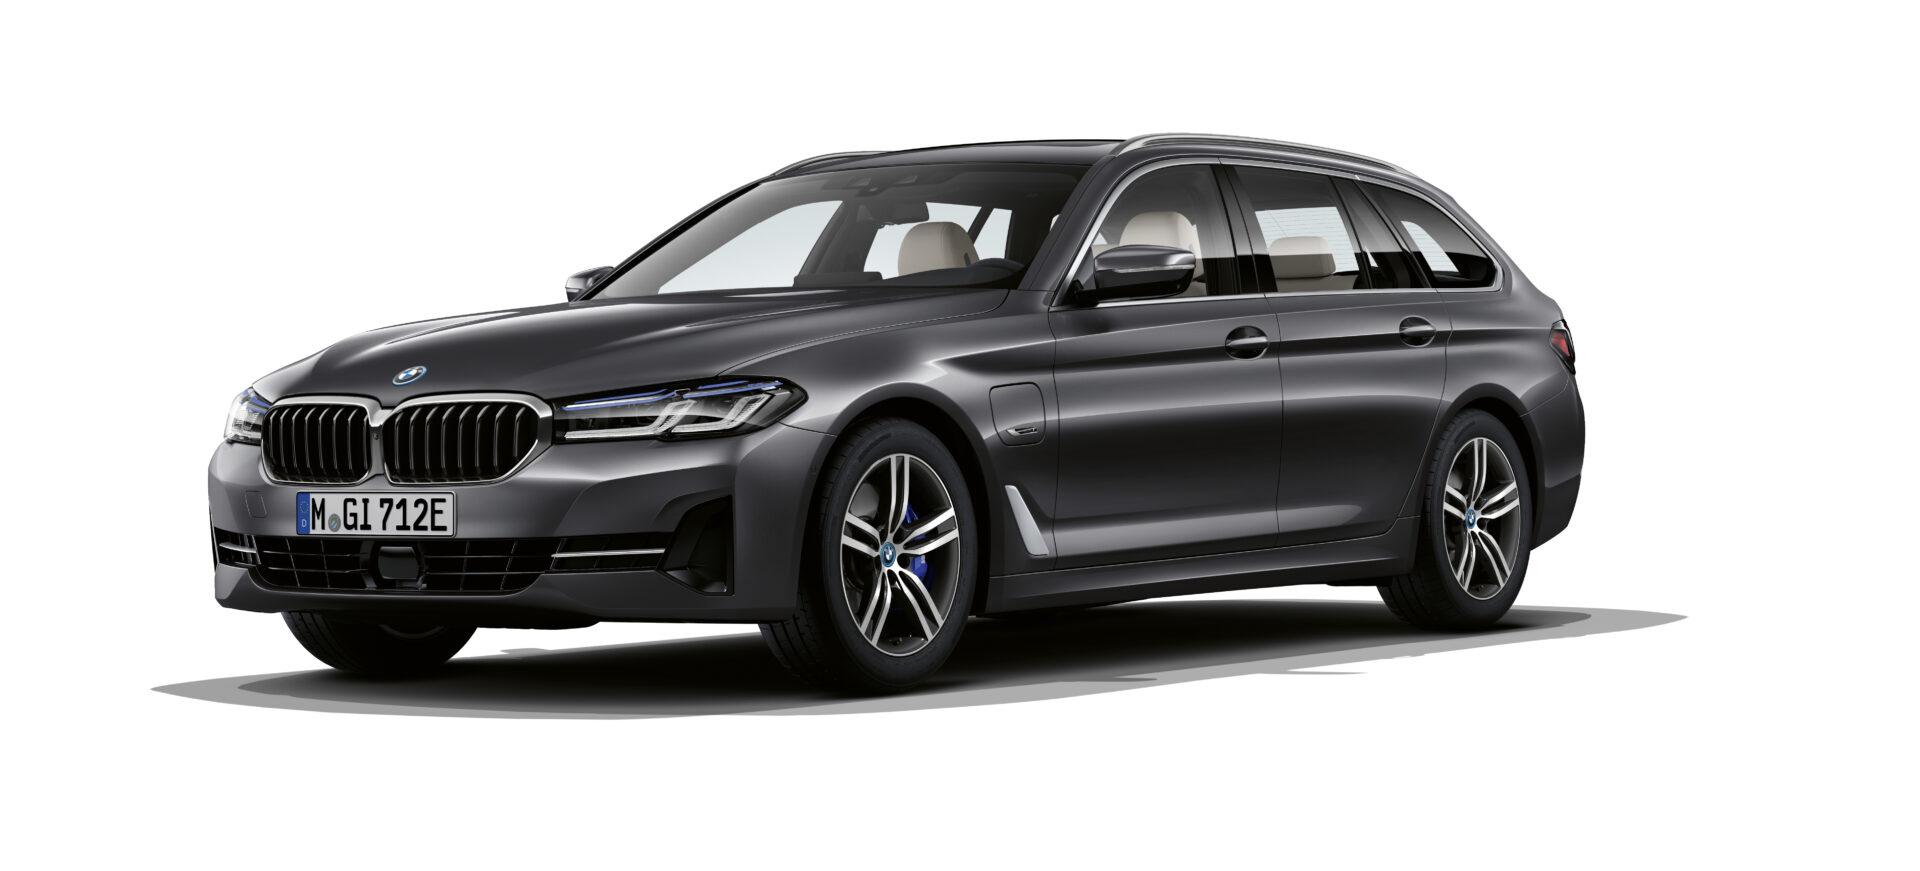 Dunkelgrauer BMW 5er Touring Modell 2021